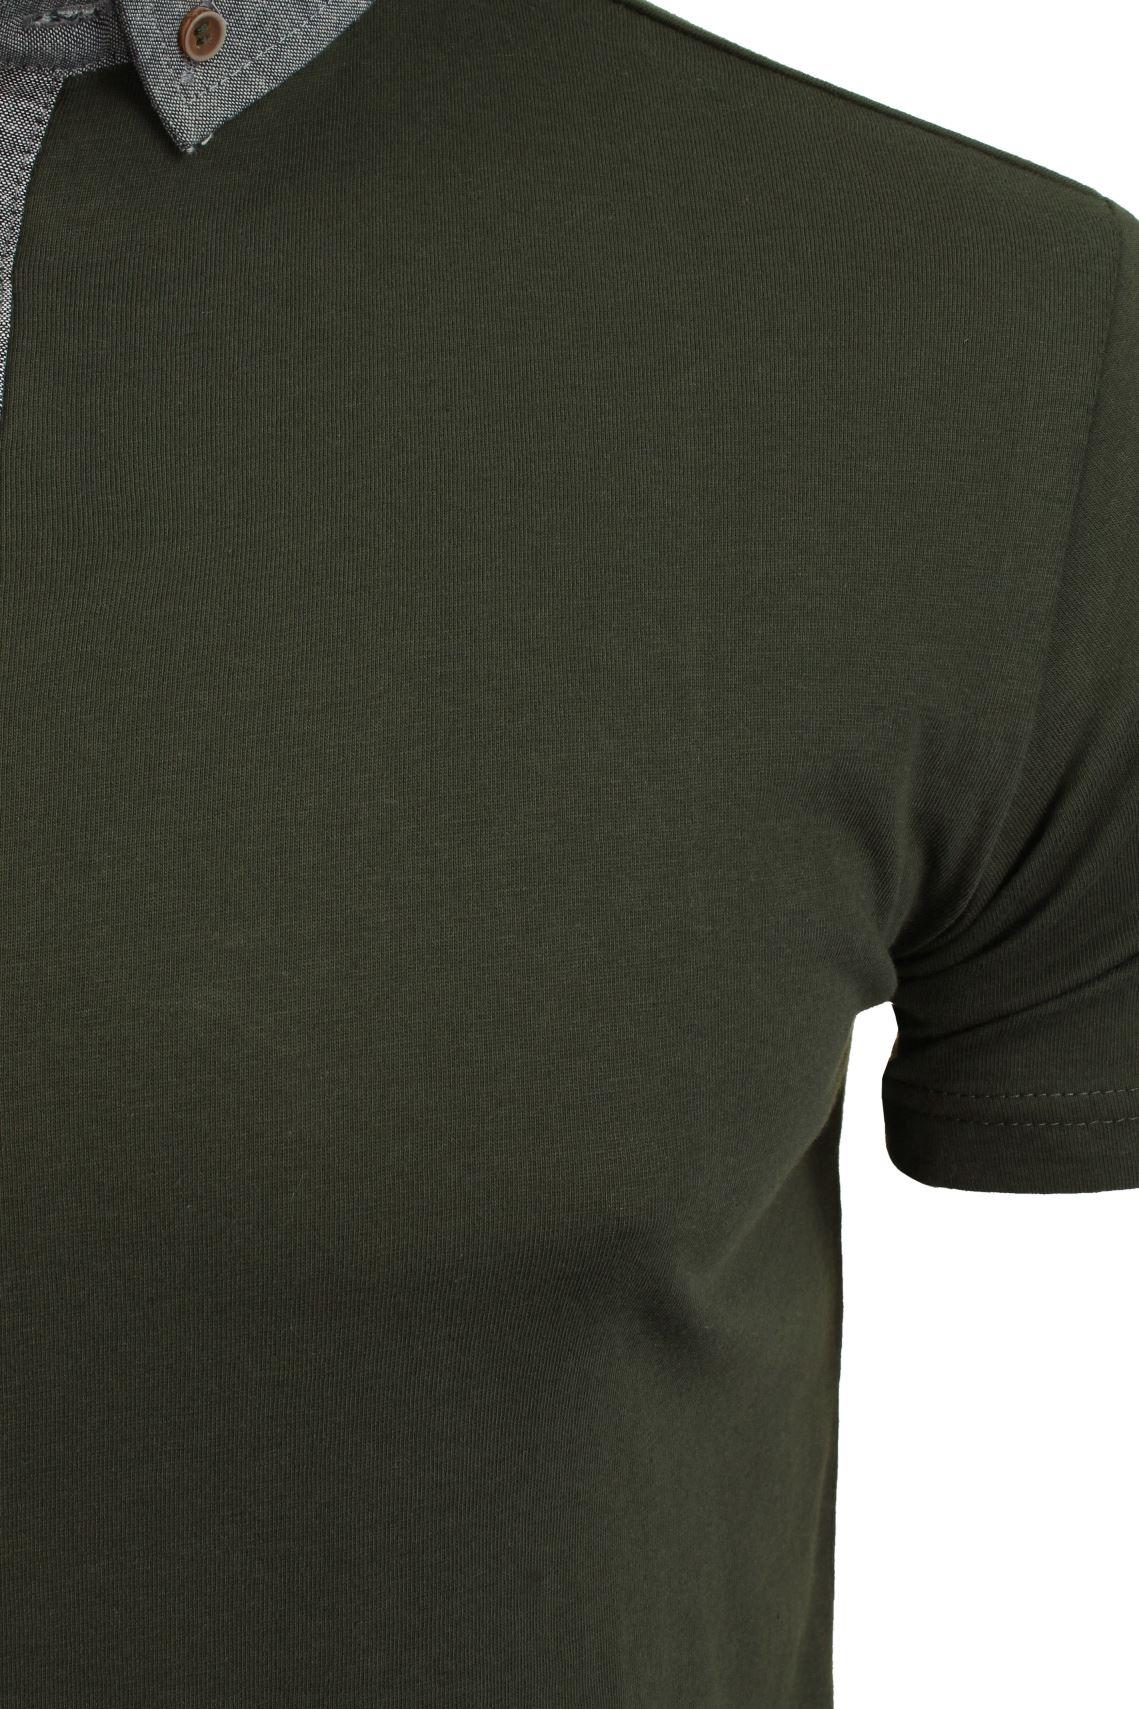 Mens-Polo-T-Shirt-Chimera-Brave-Soul-Denim-Chambray-Collar-Short-Sleeved-Cotton thumbnail 14